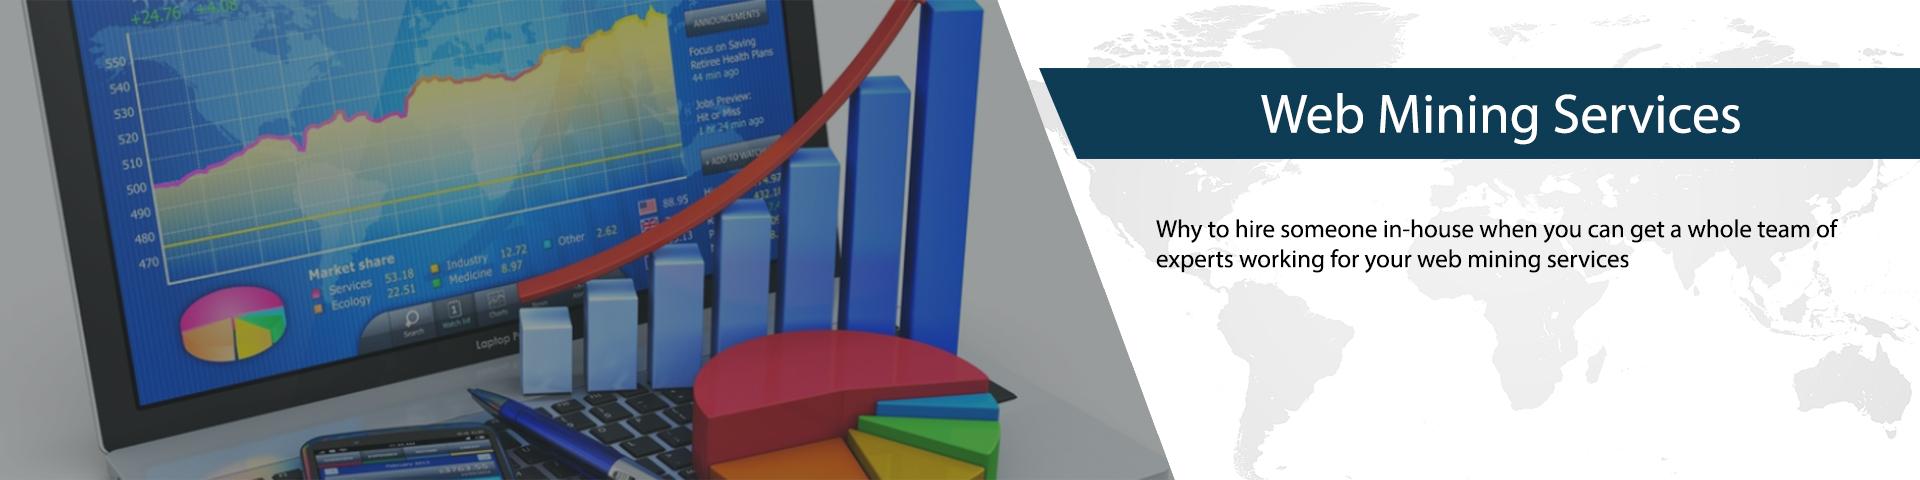 Web Mining Services